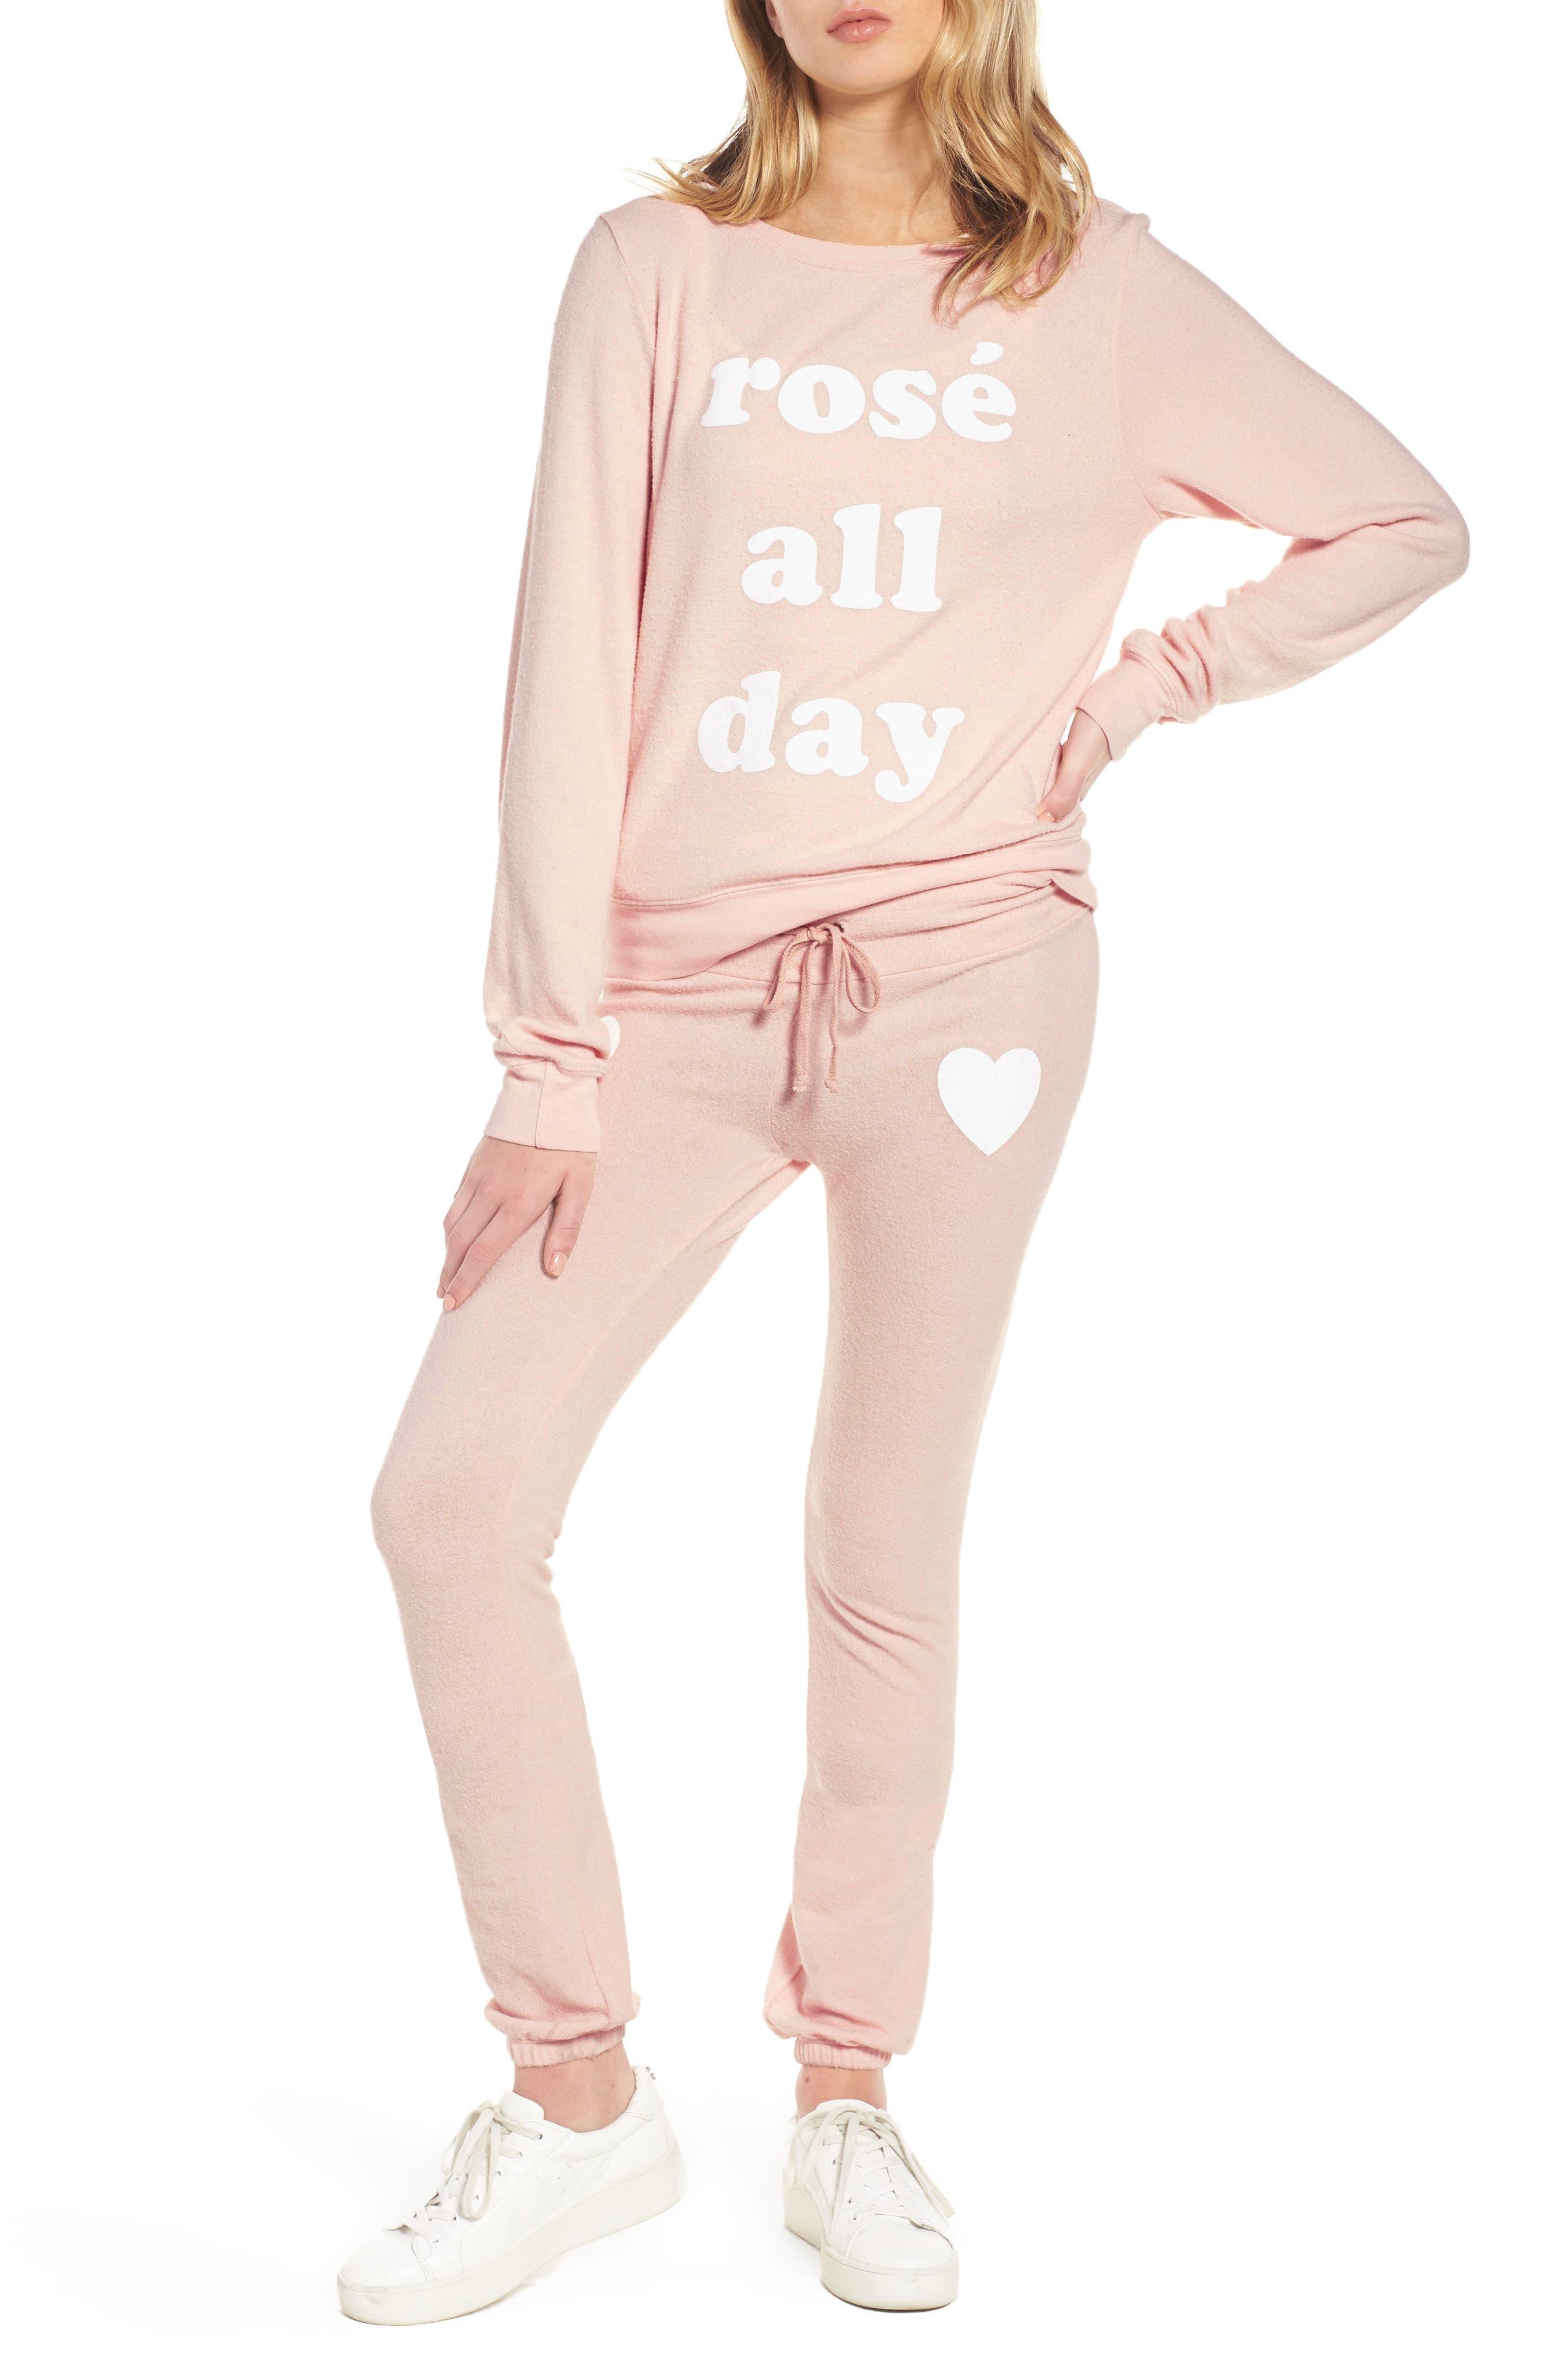 Rosé All Day Skinny Pants,                             Alternate thumbnail 7, color,                             650